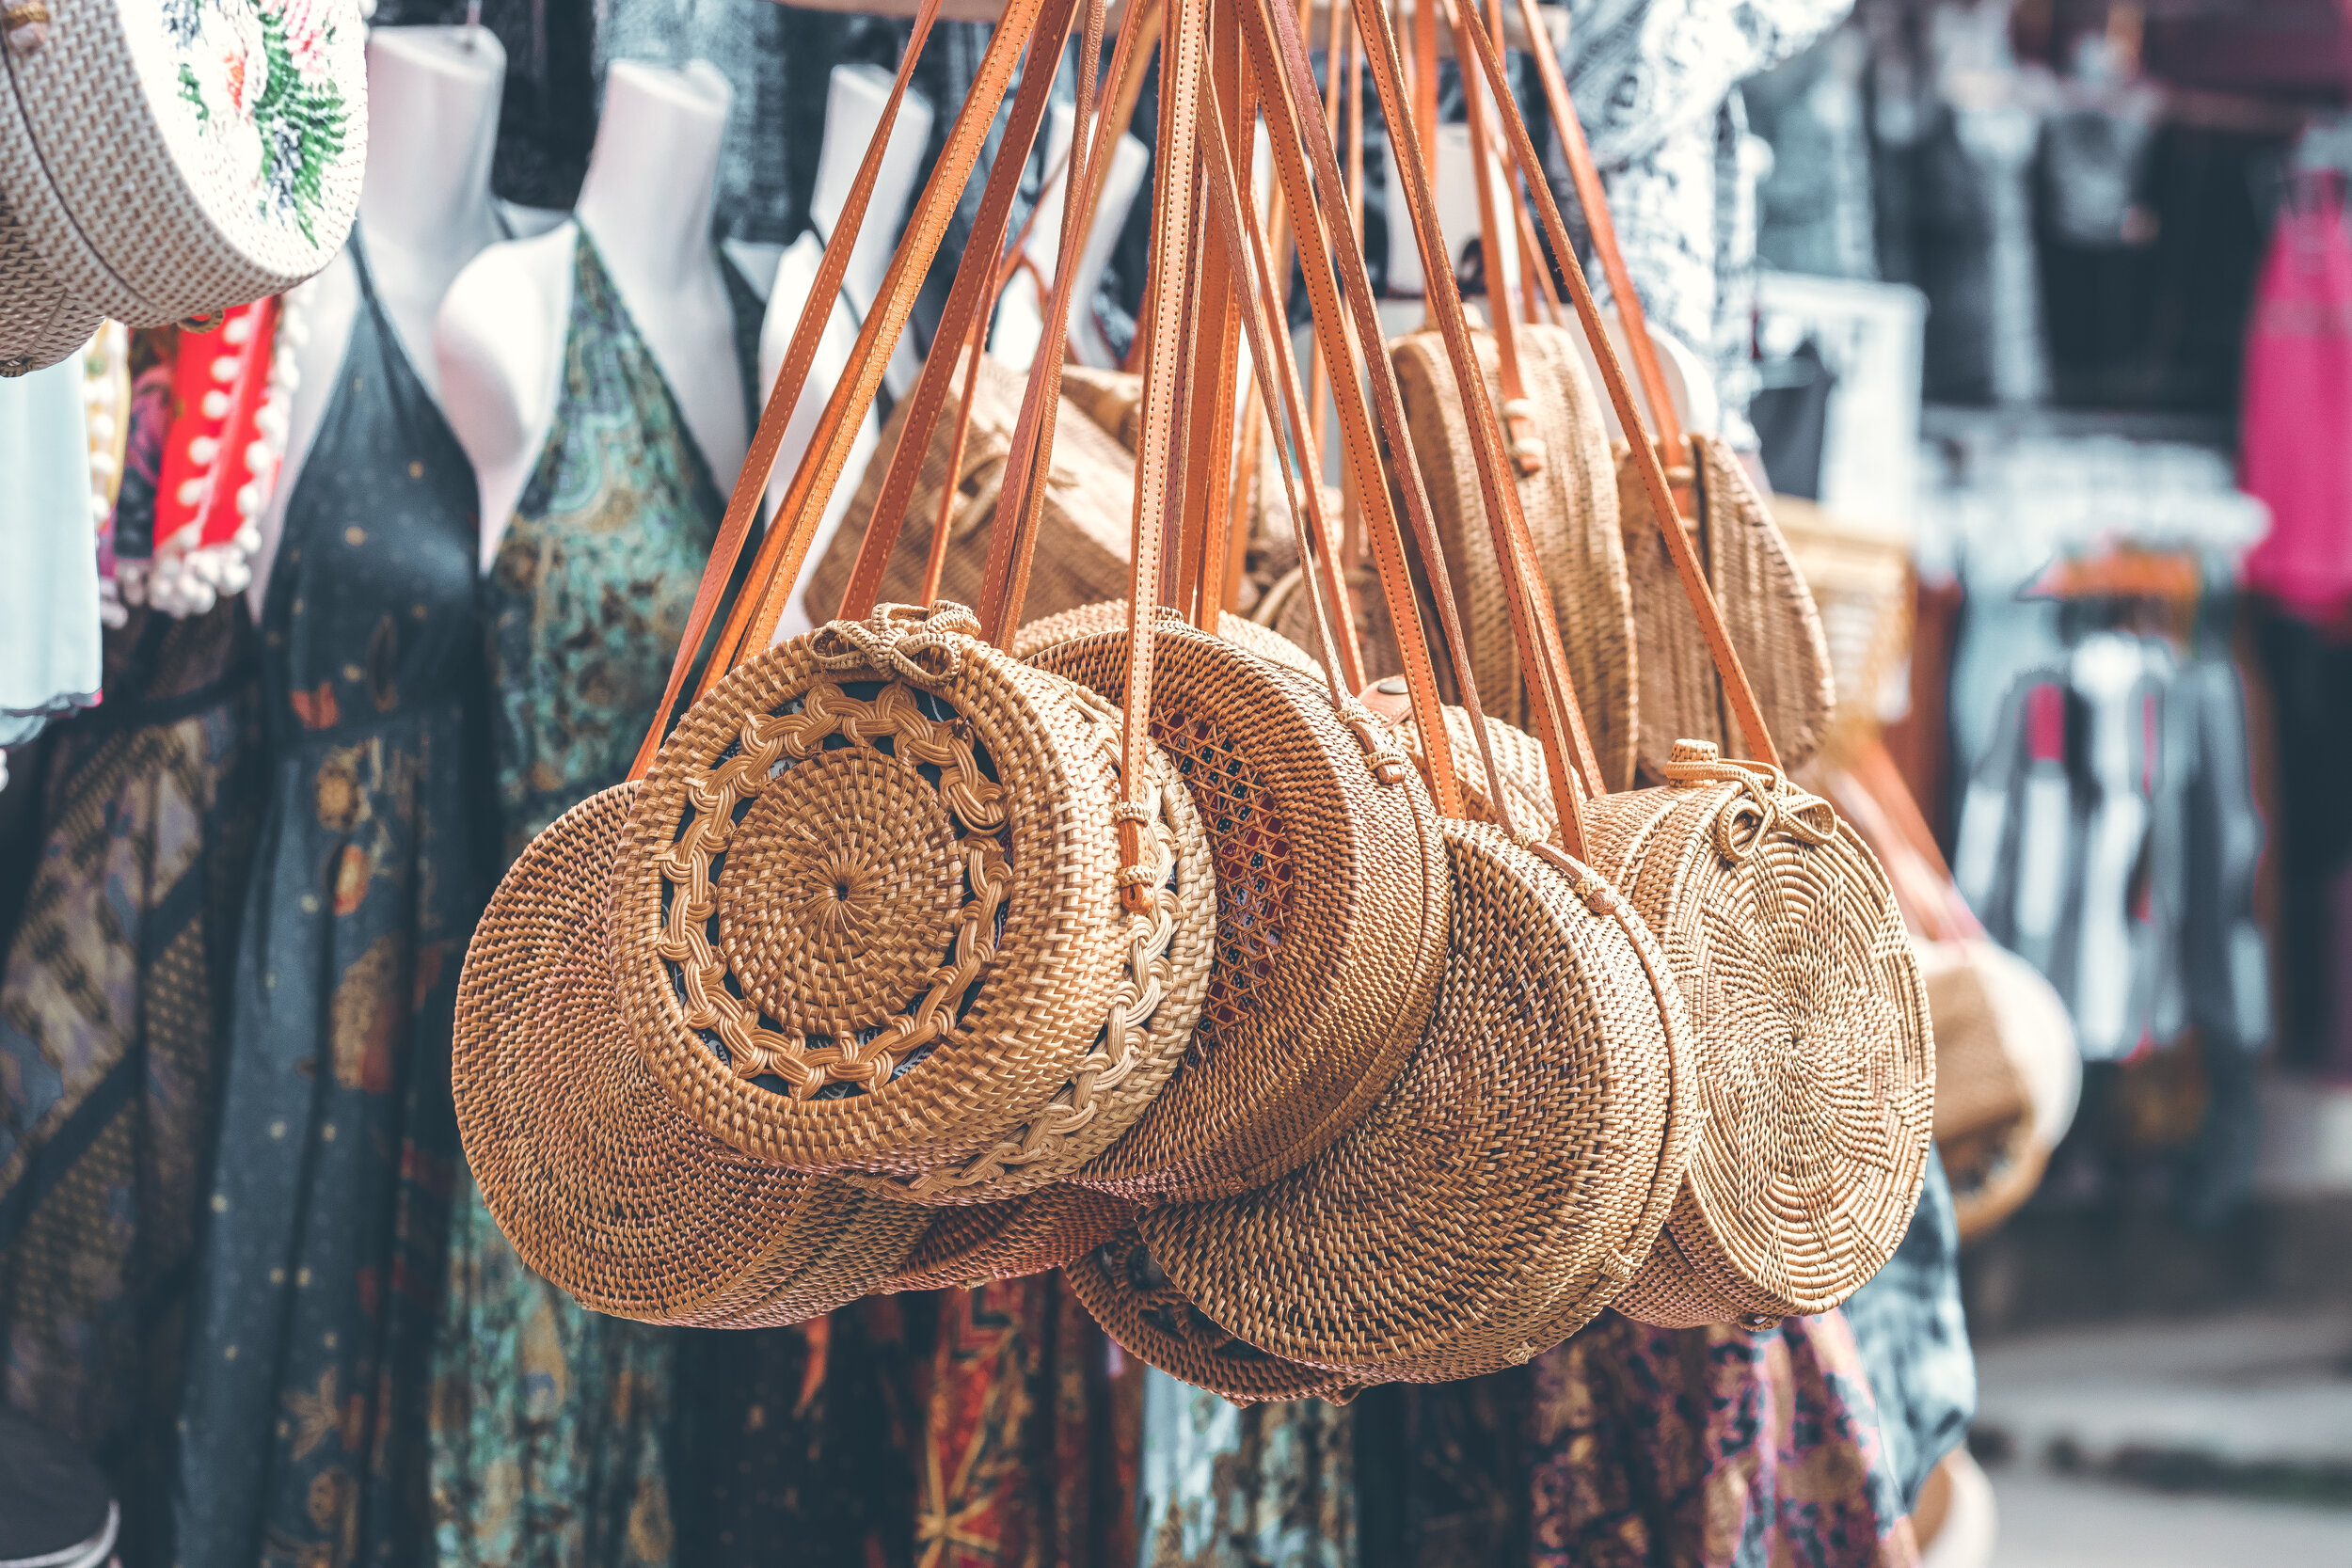 Bali market finds